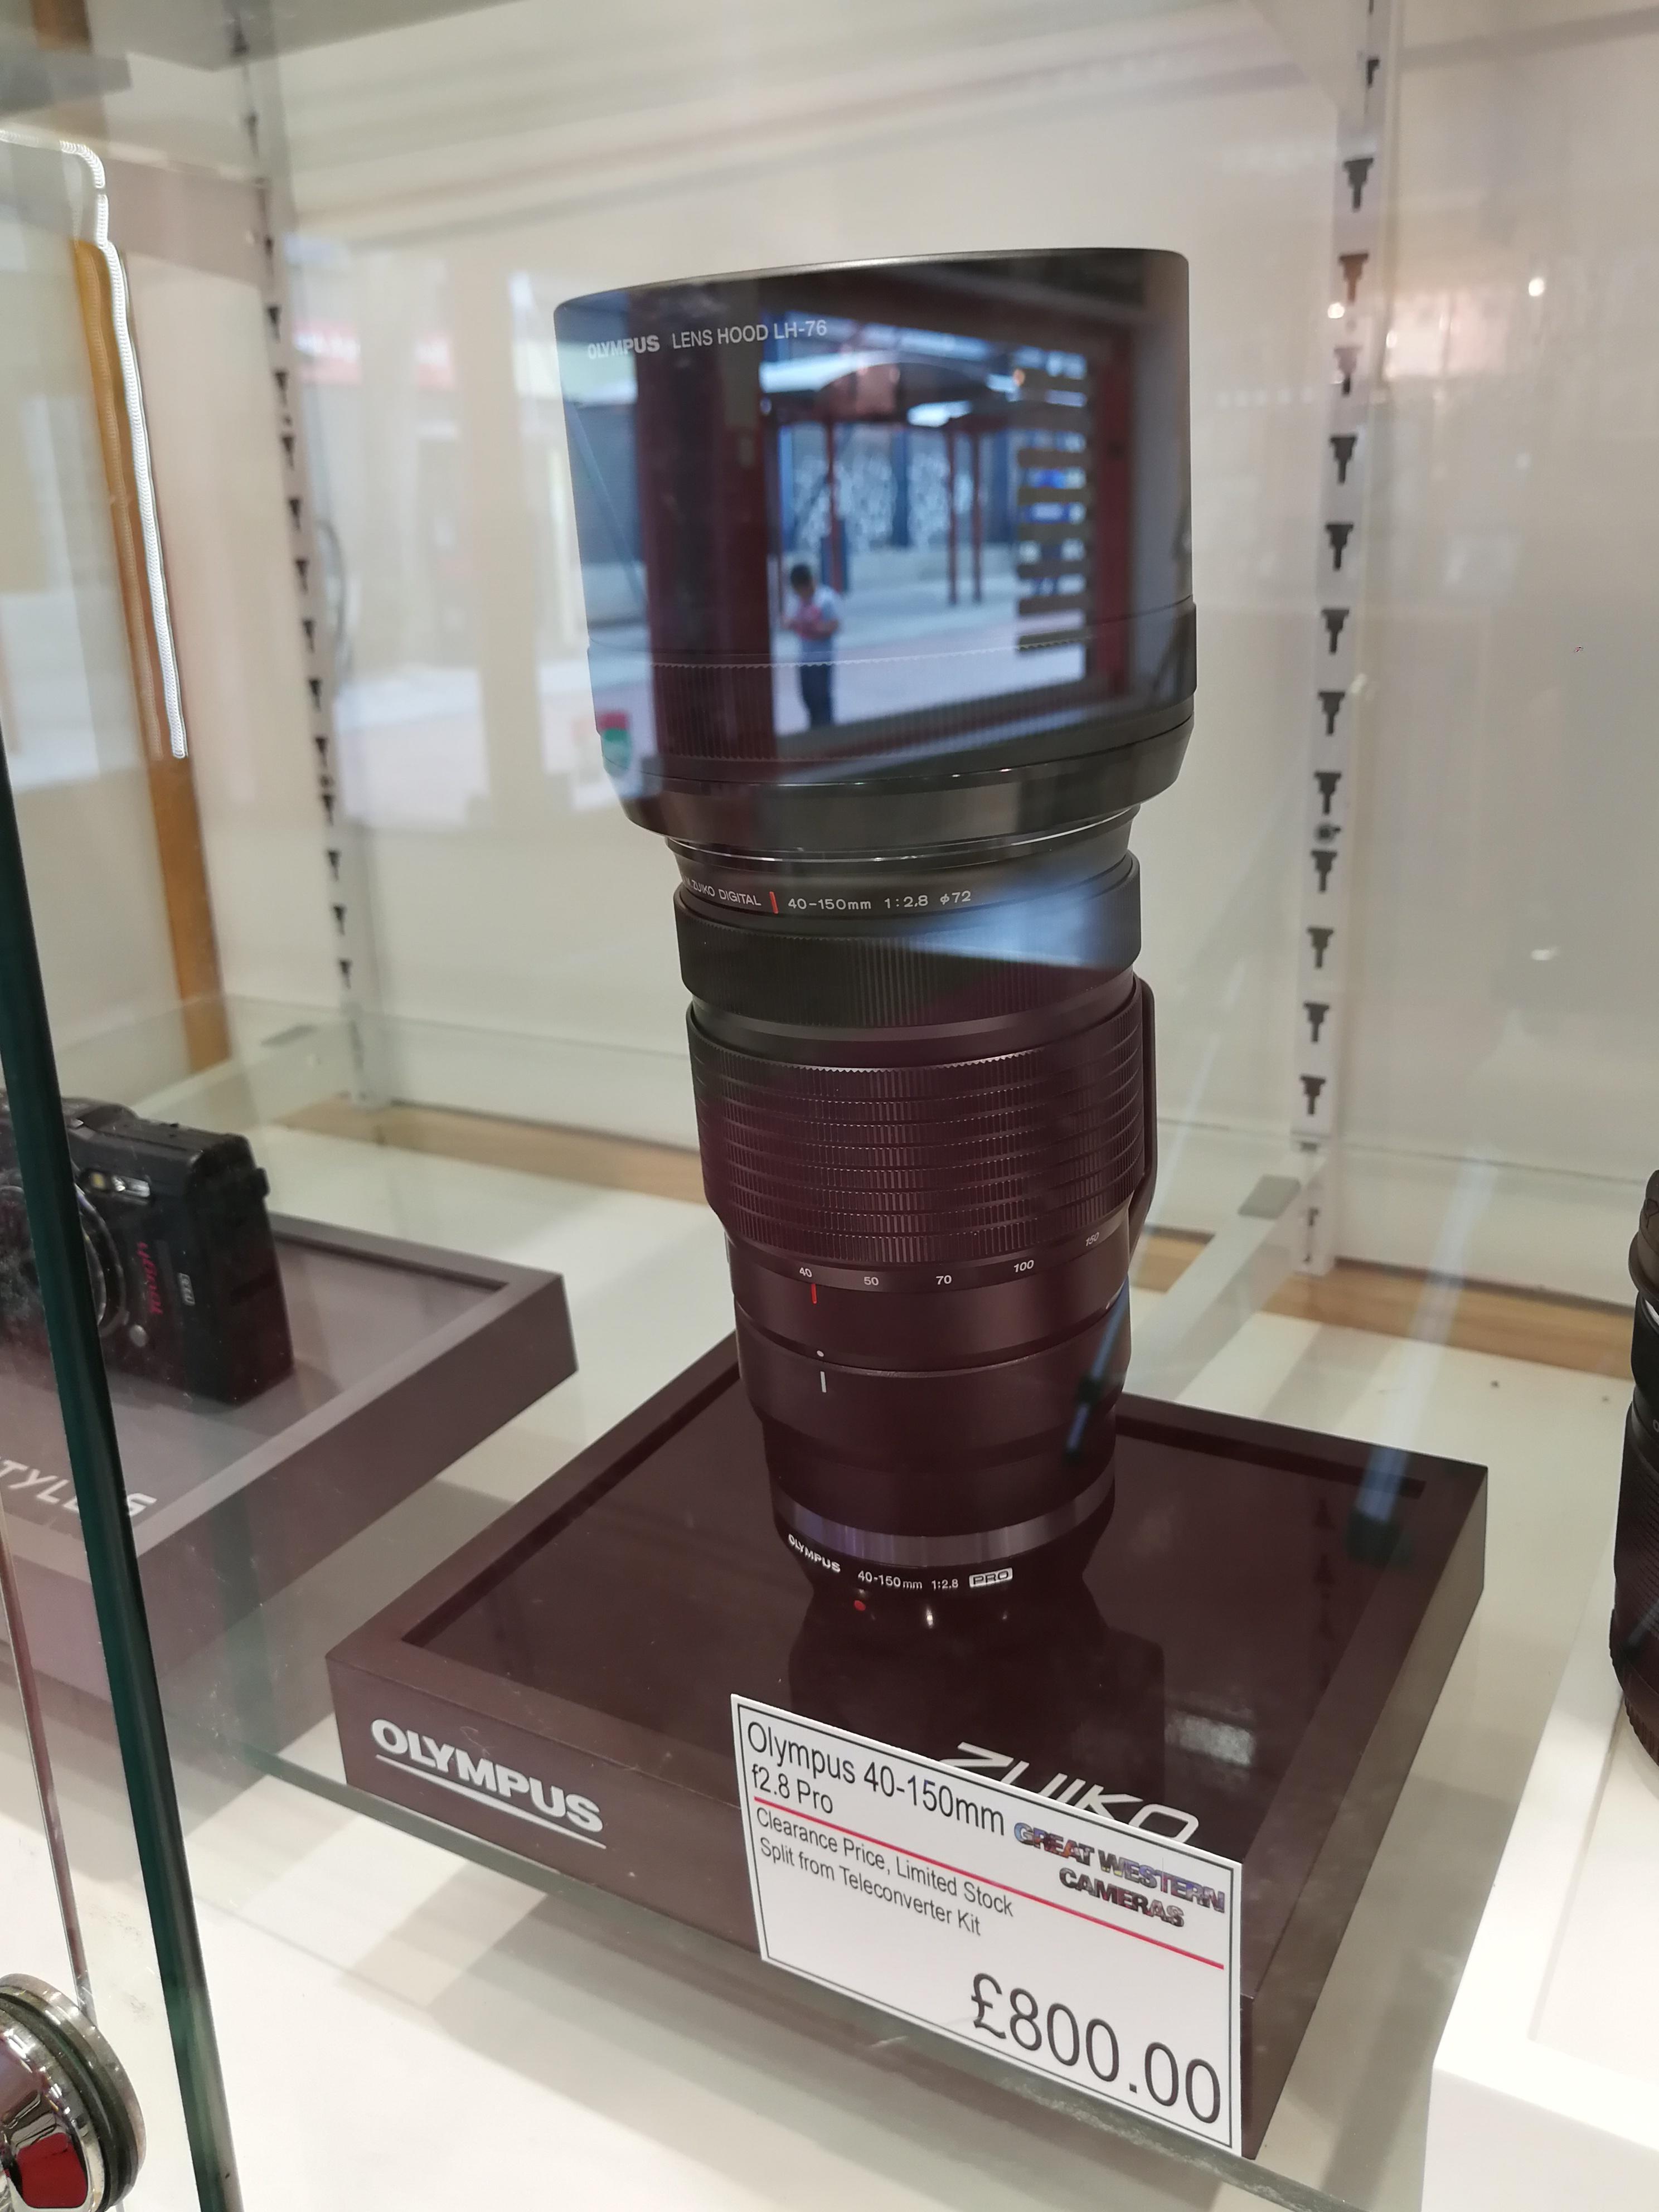 Olympus 40-150mm f2.8 PRO lens £800 - Great western cameras Swindon